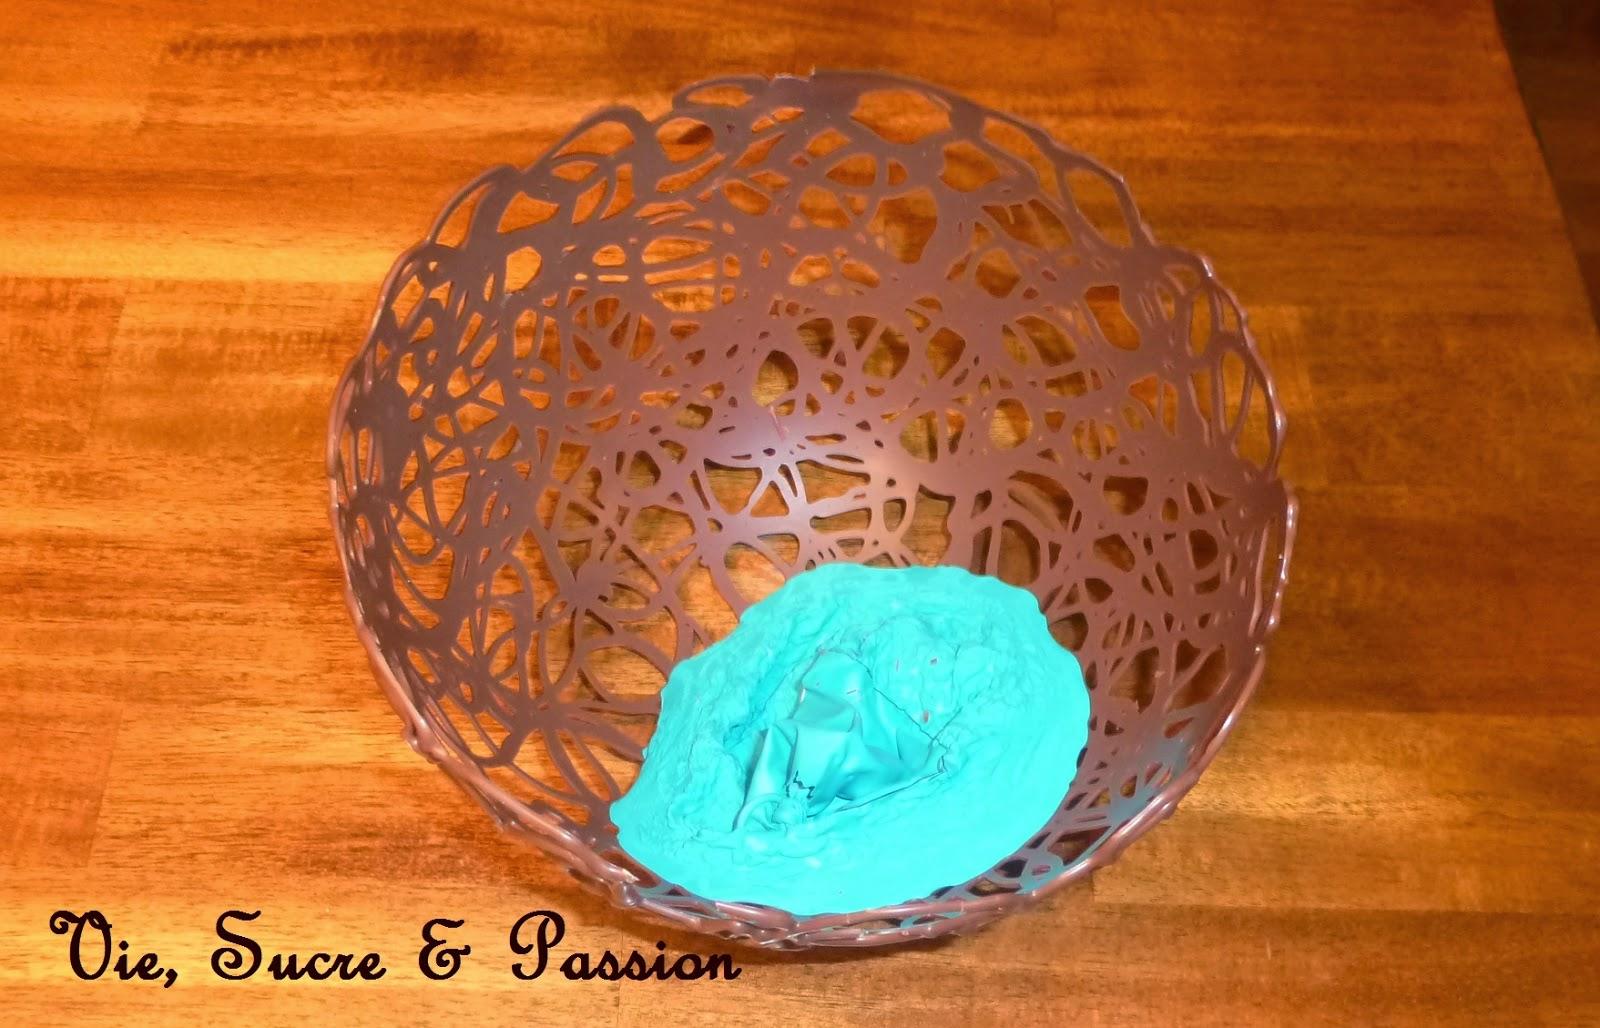 How to make a chocolate dome